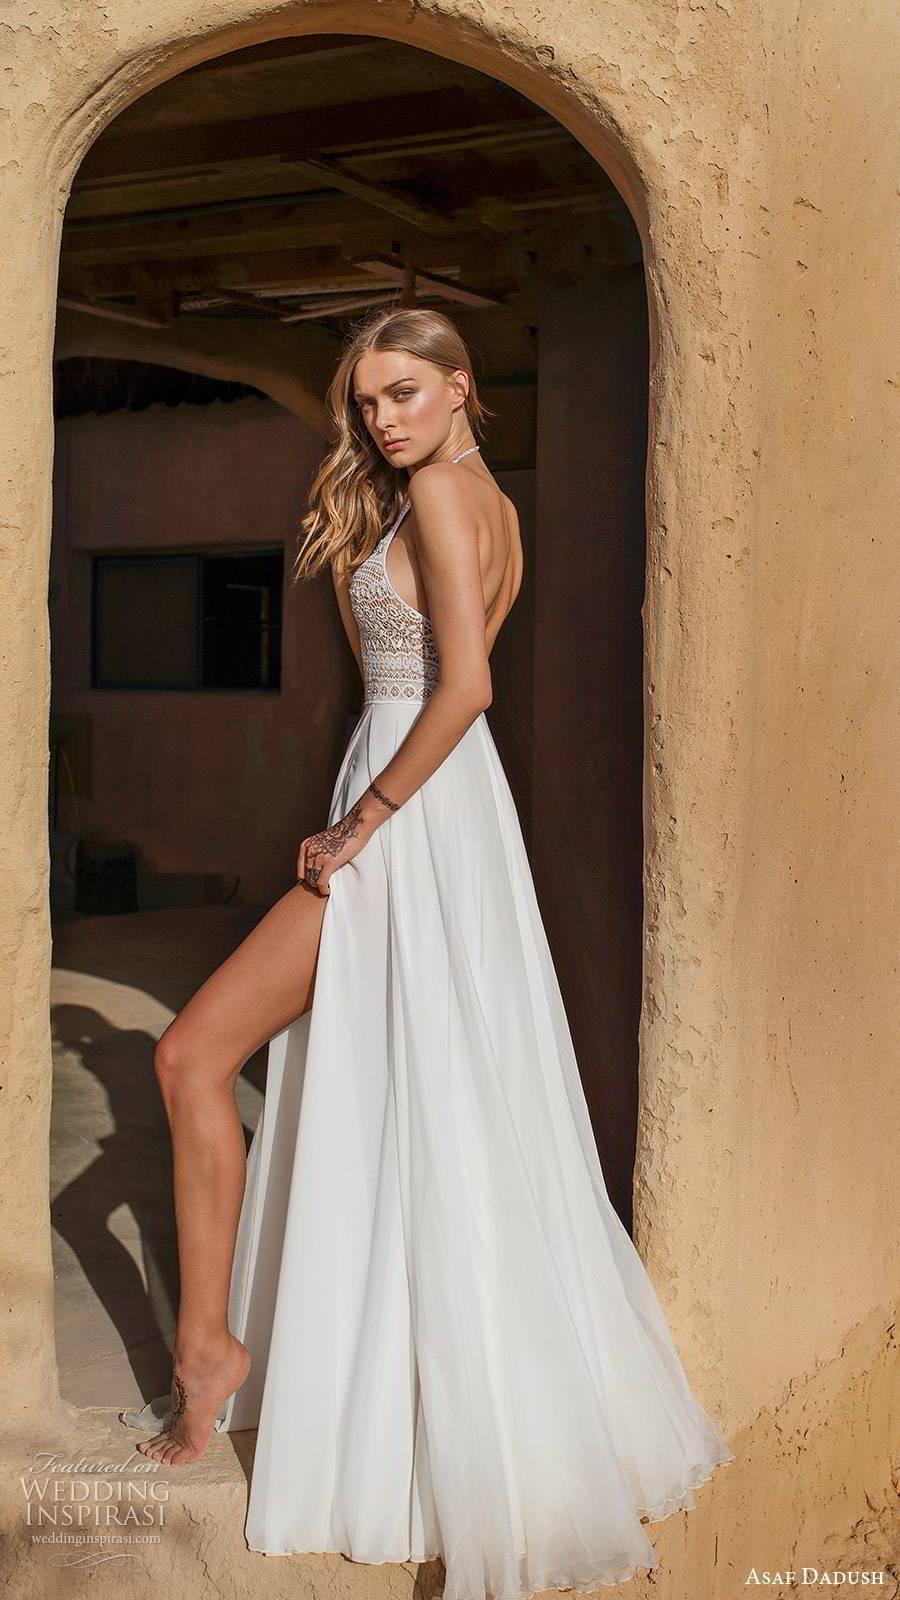 asaf dadush 2019 bridal sleeveless halterneck embellished cutout bodice clena skirt boho romantic a line wedding dress (10) sv